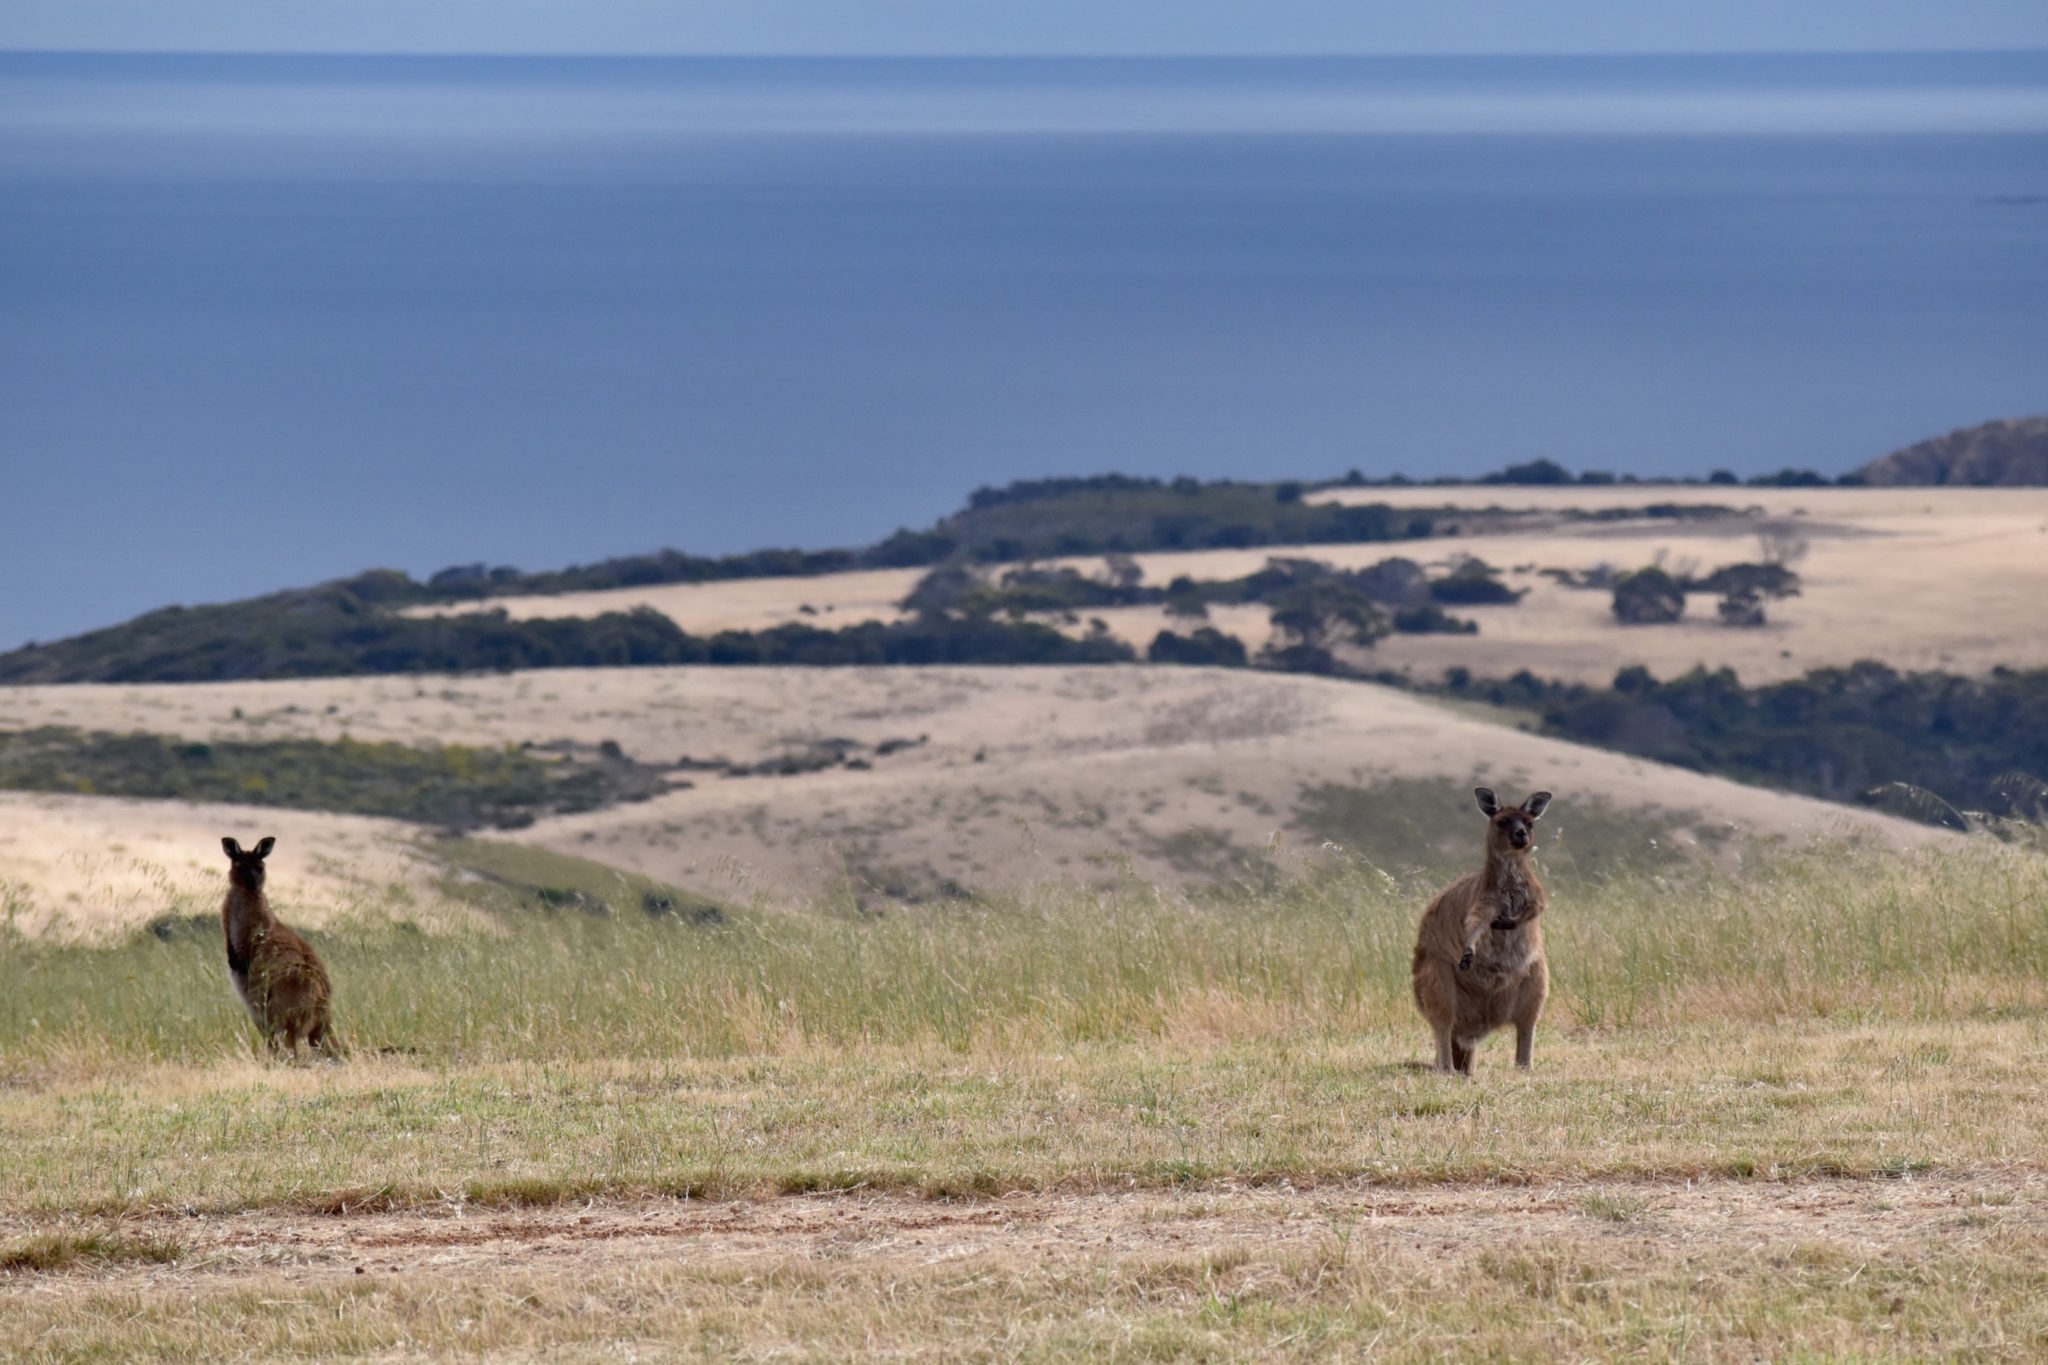 Kangaroo Island, South Australia – A Complete Guide for a Long Weekend